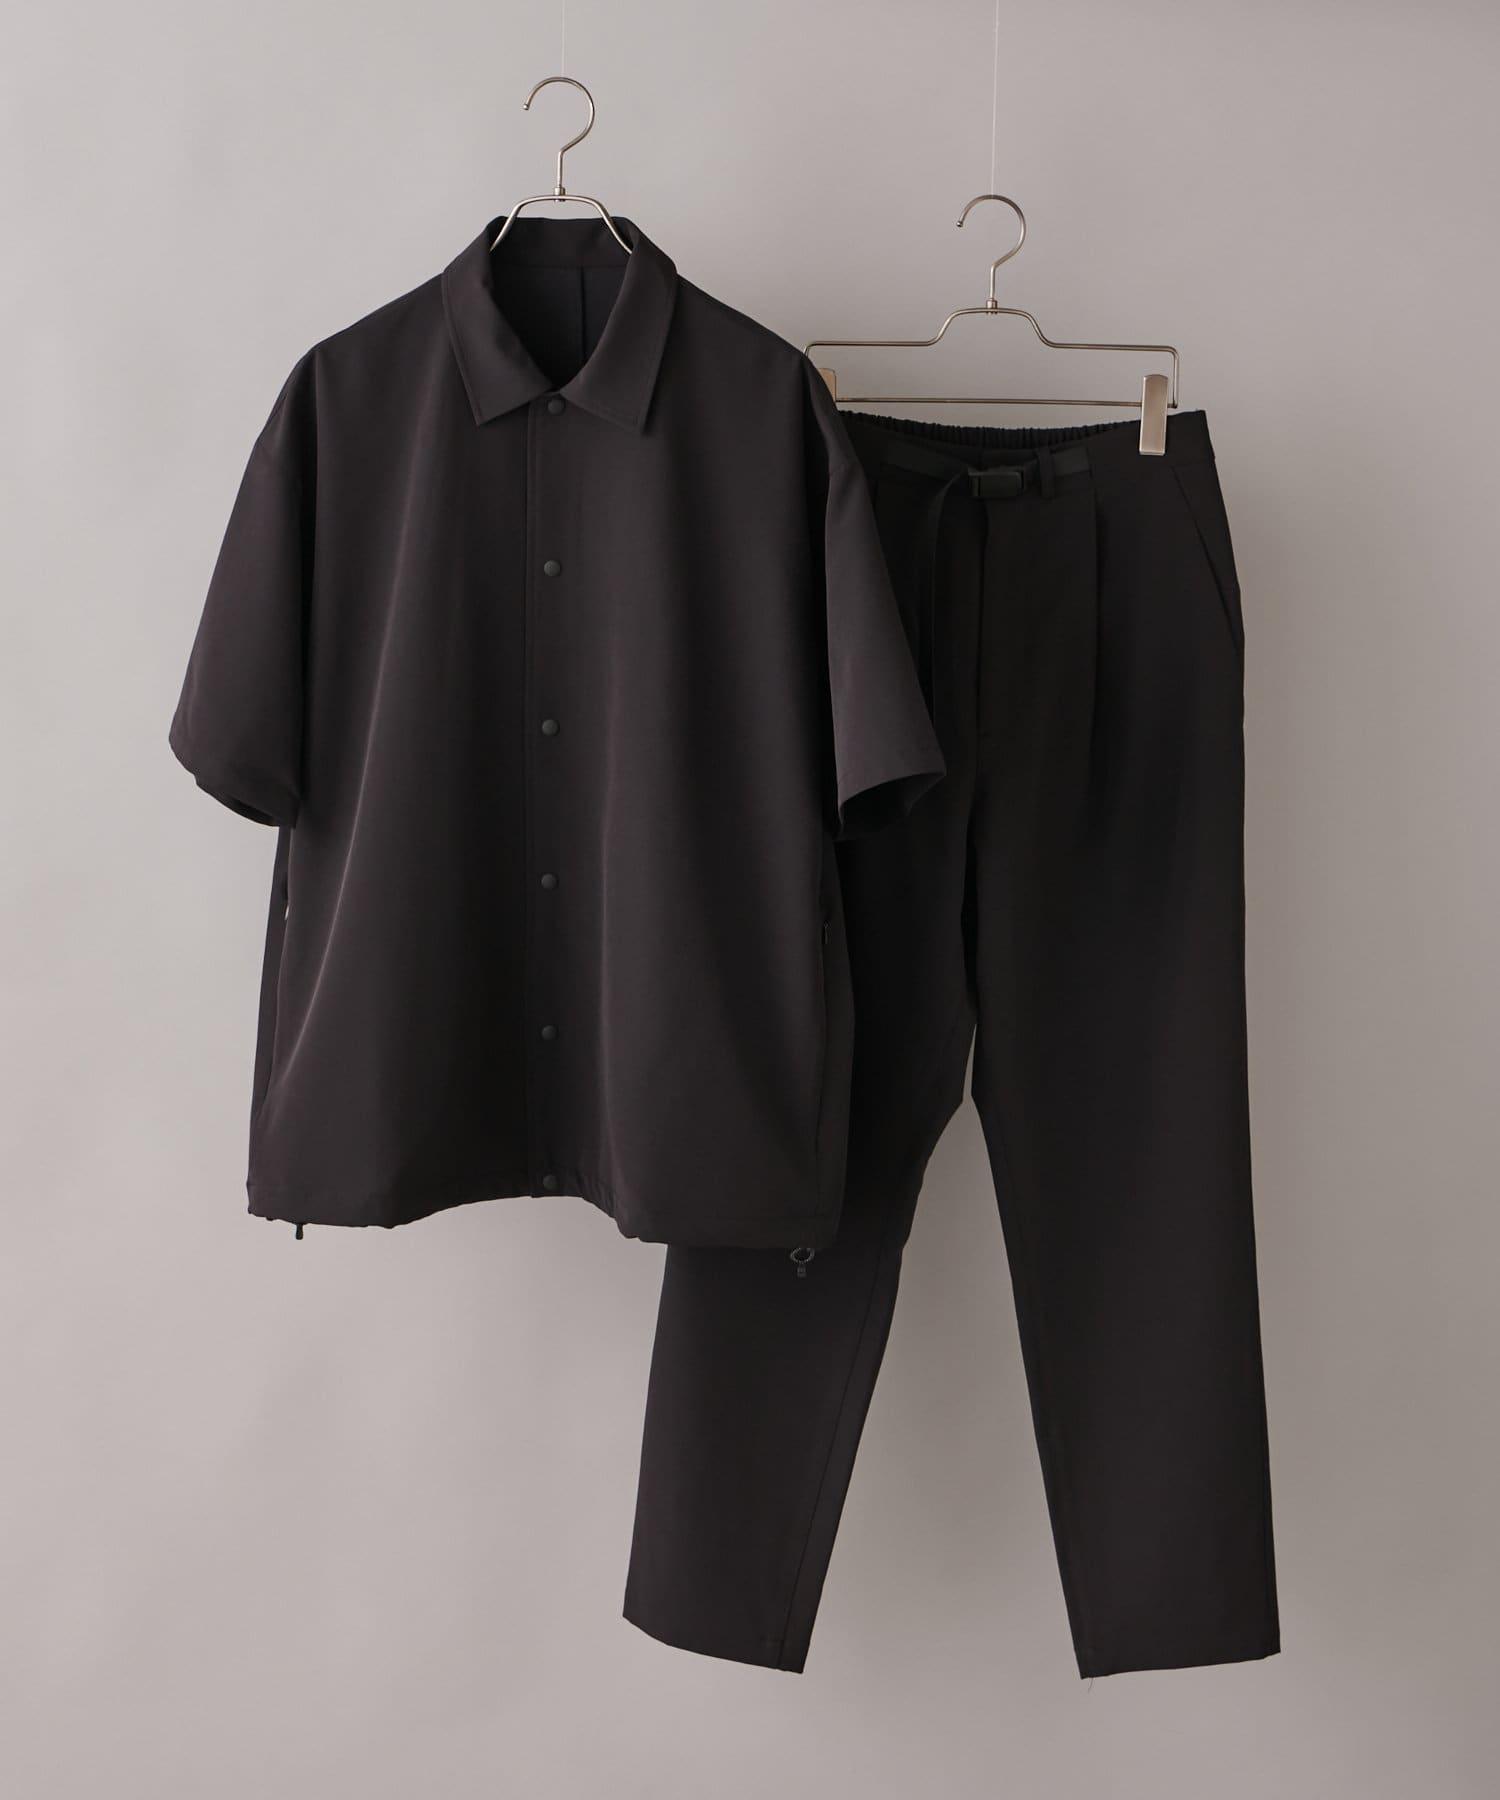 CIAOPANIC(チャオパニック) メンズ 【SHELTECH(R)/シェルテック】スナップシャツセットアップ ブラック